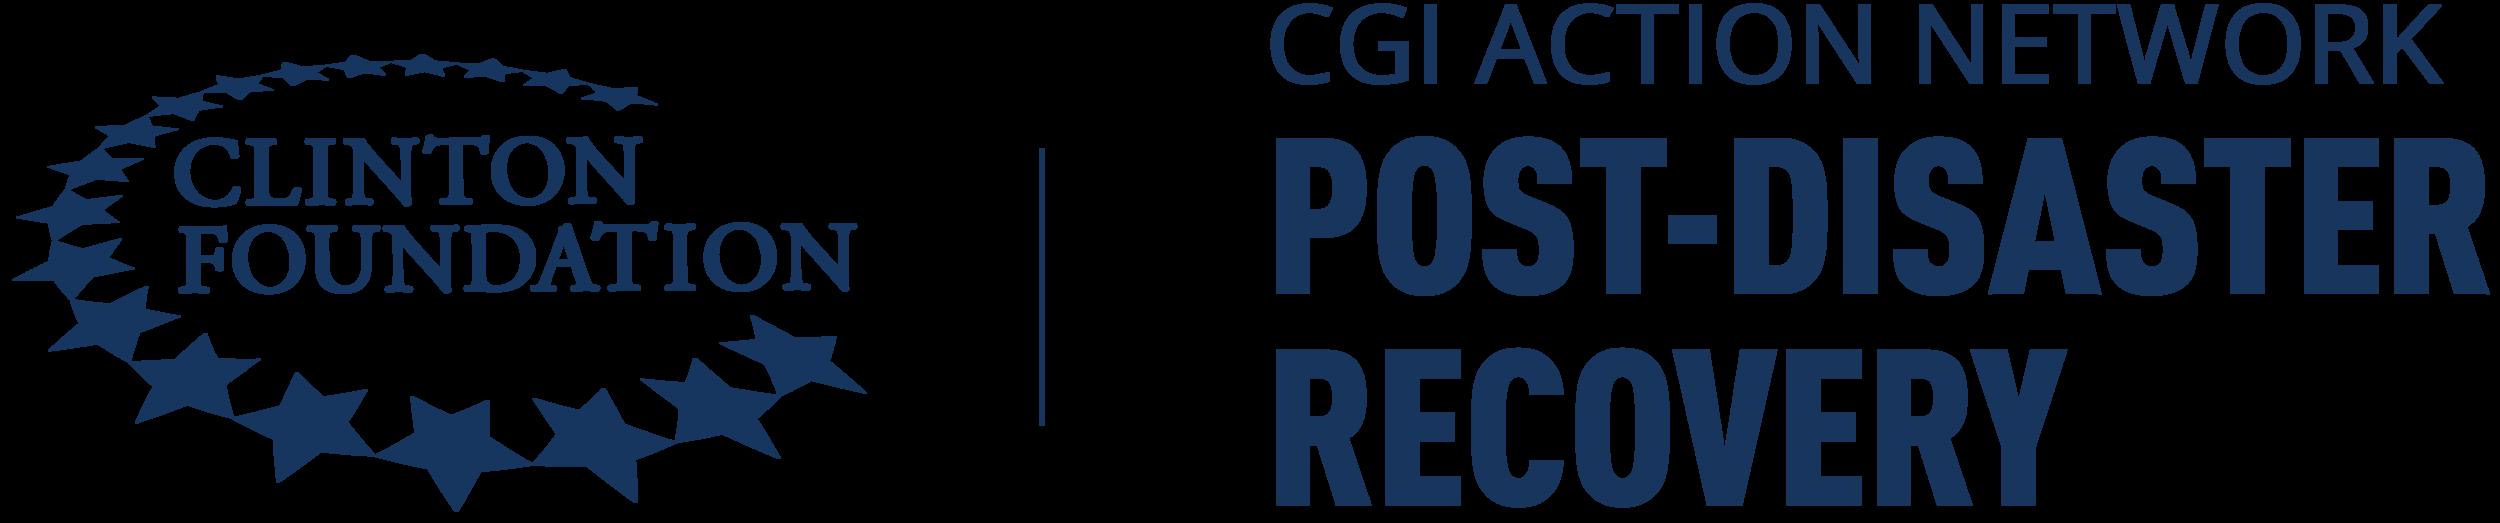 CGI AN logo 2019_Blue.png